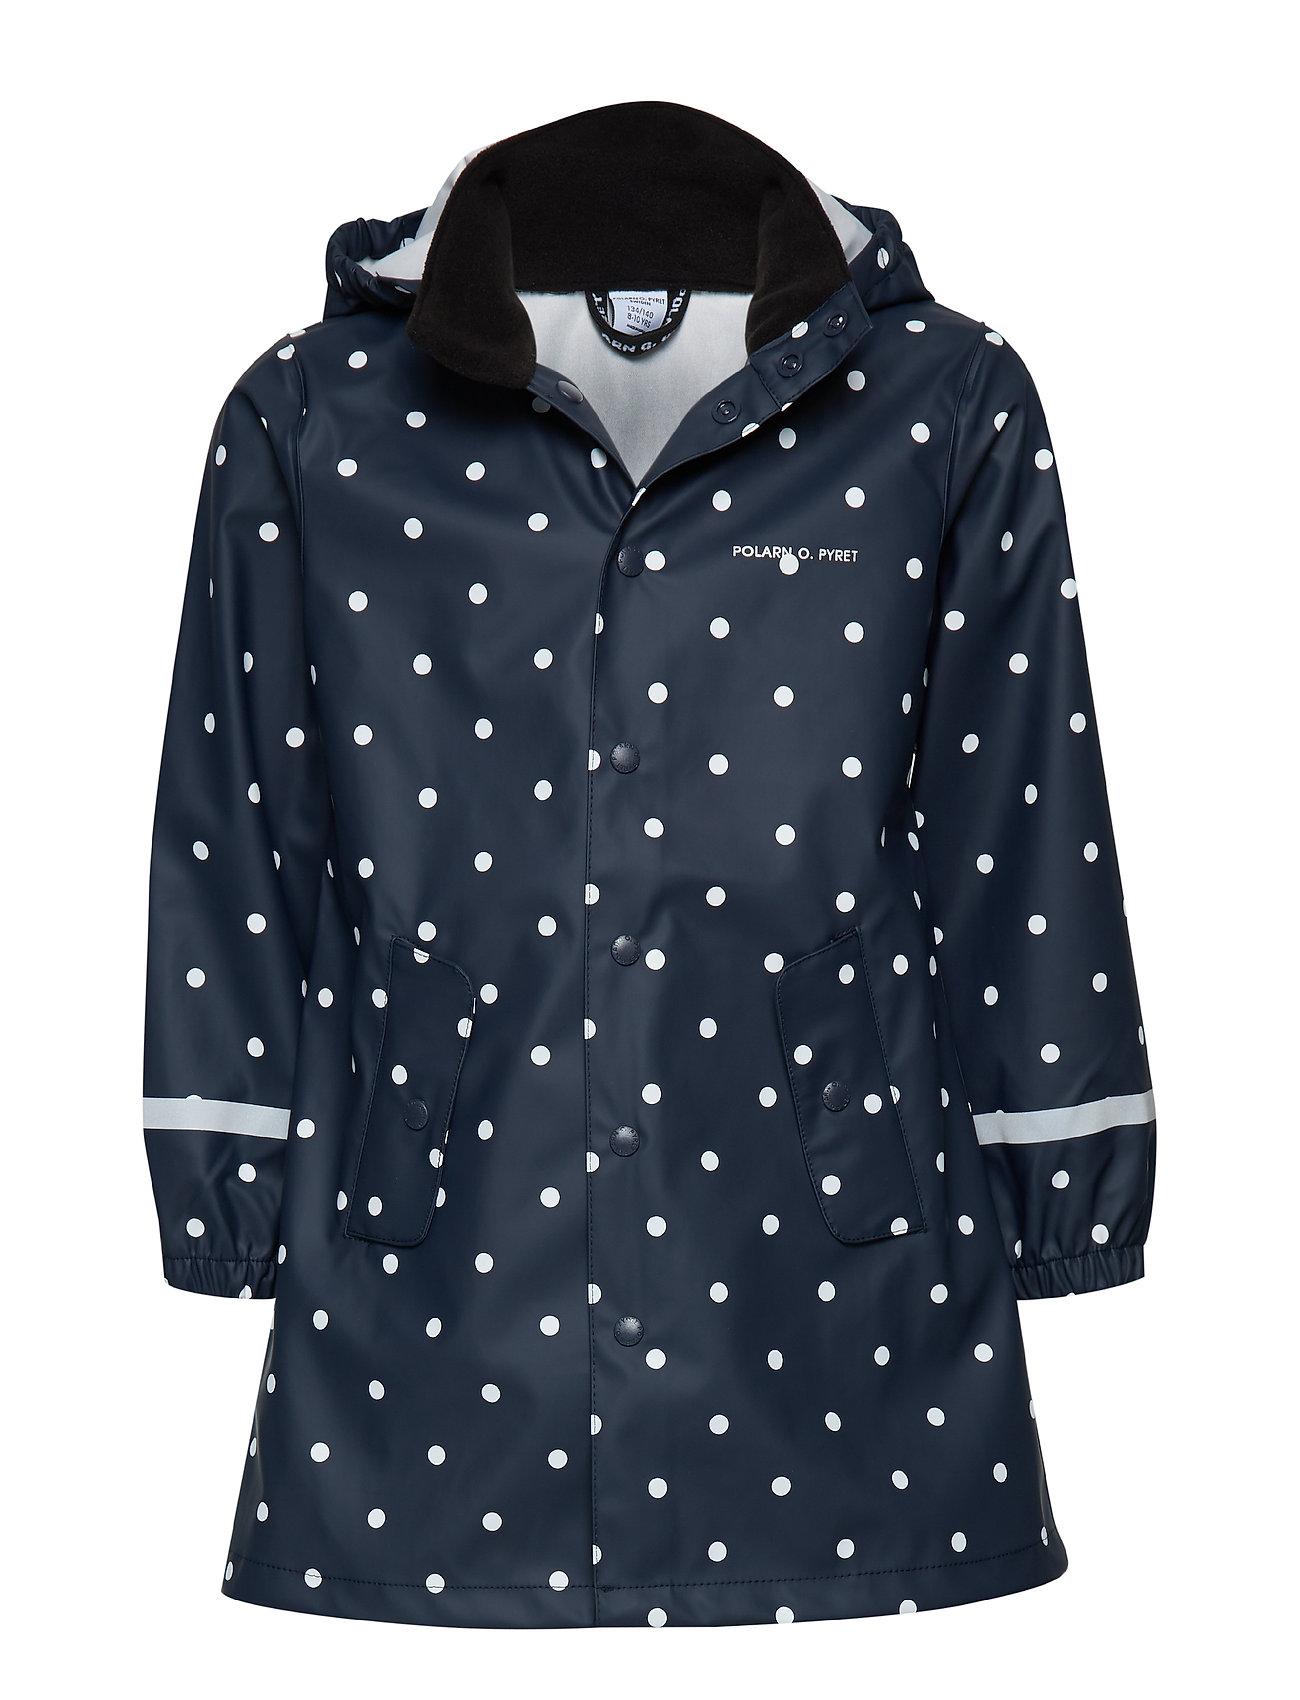 Polarn O. Pyret Waterproof Rain Coat